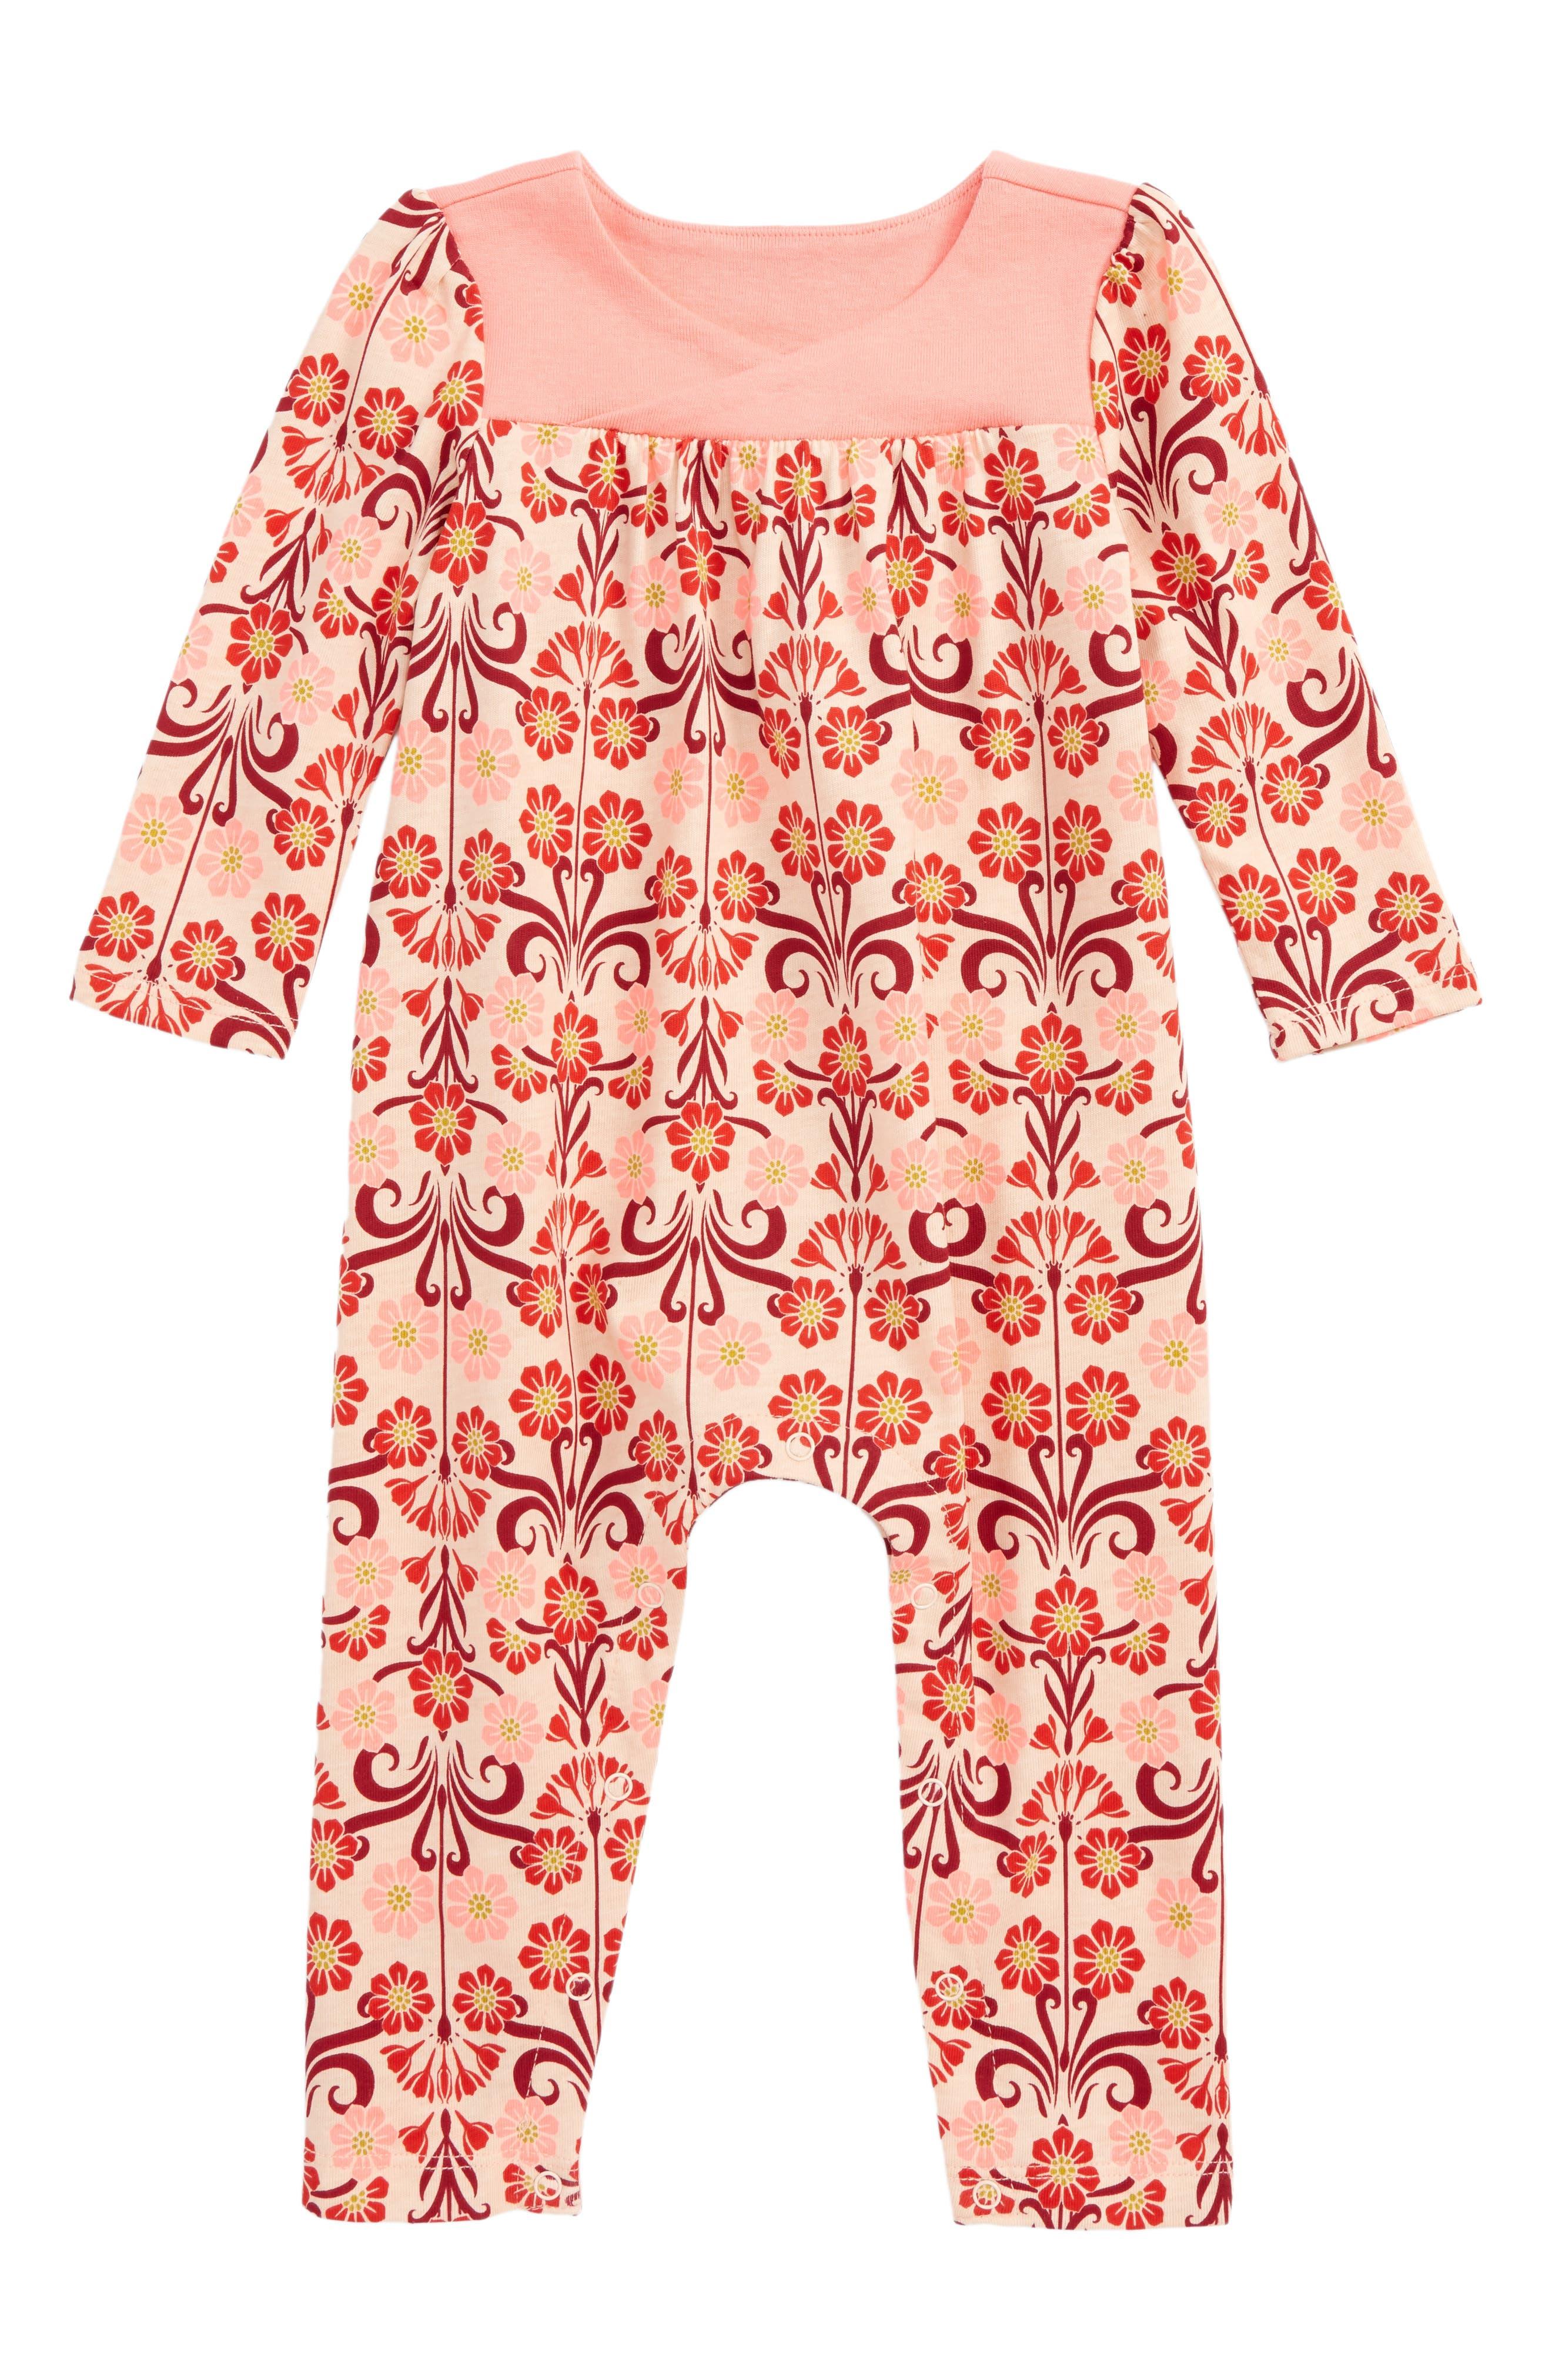 Main Image - Tea Collection Dahlia Romper (Baby Girls)